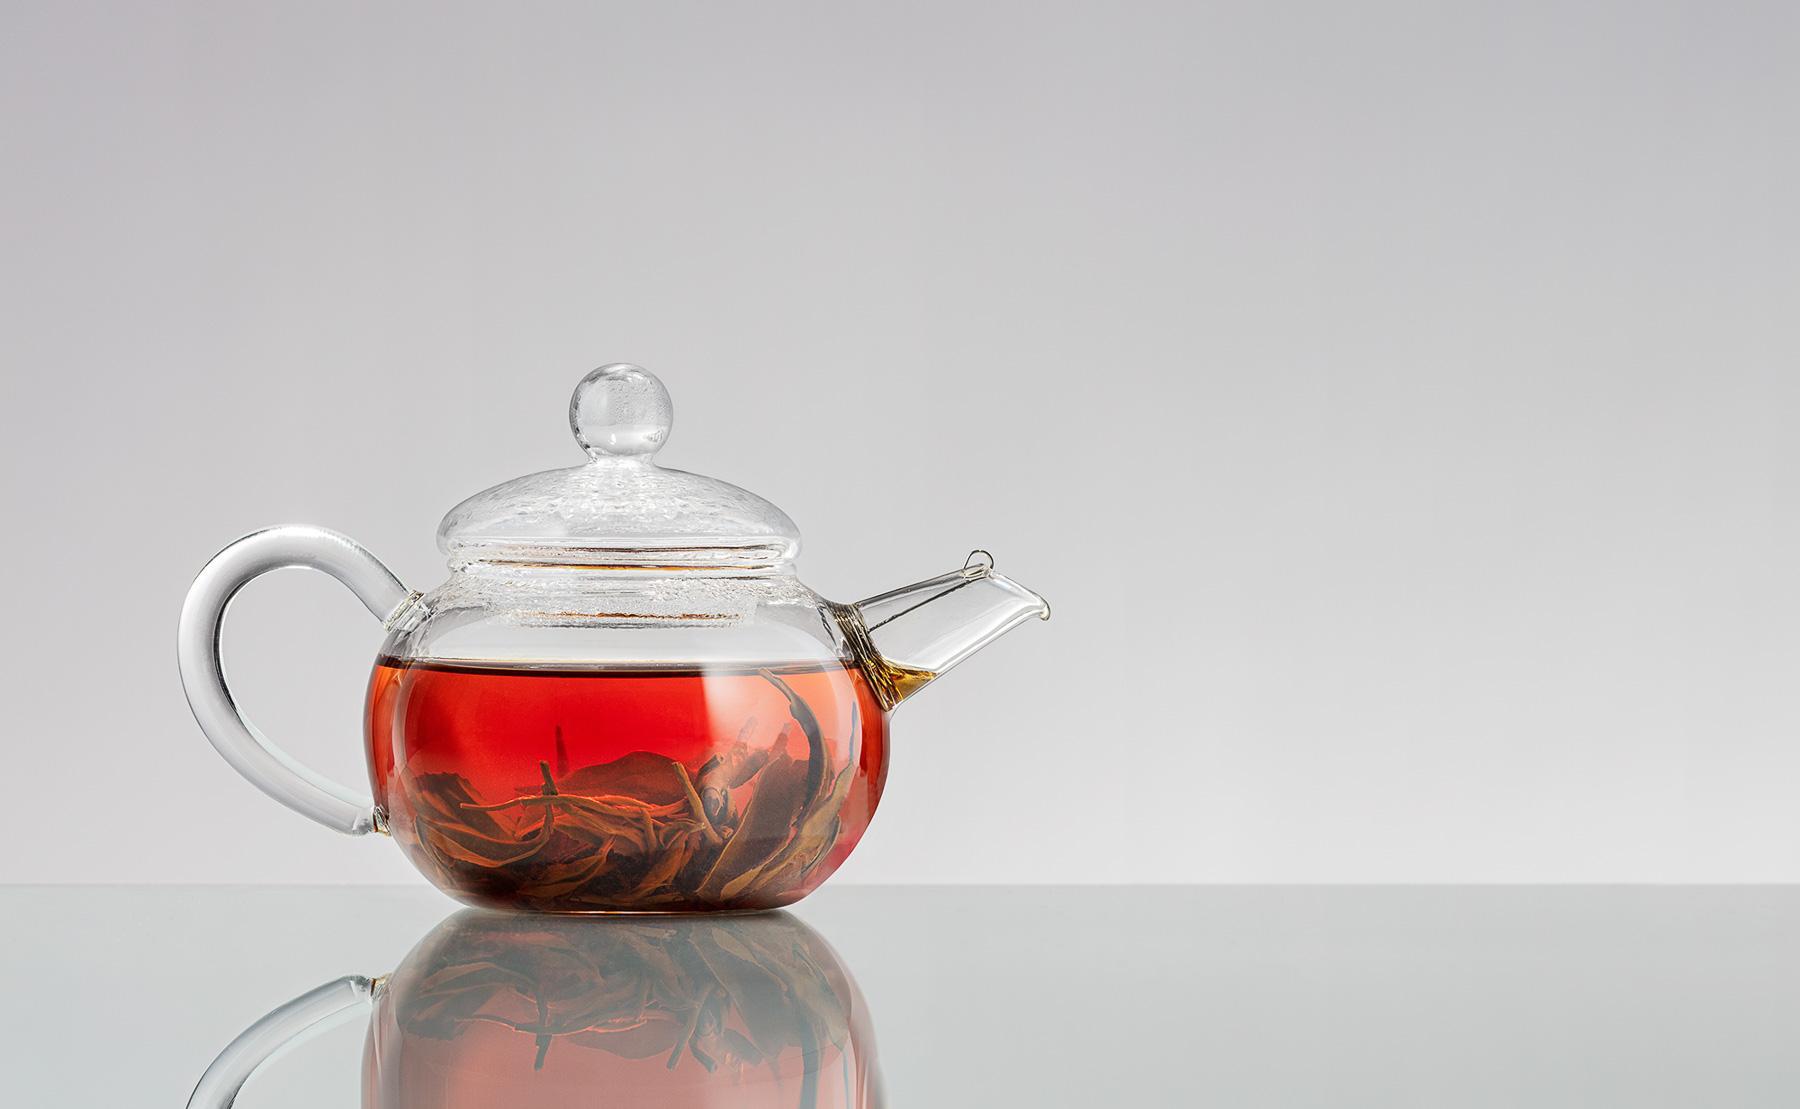 Jersey Fine Tea 22 09 2020 38475 v2